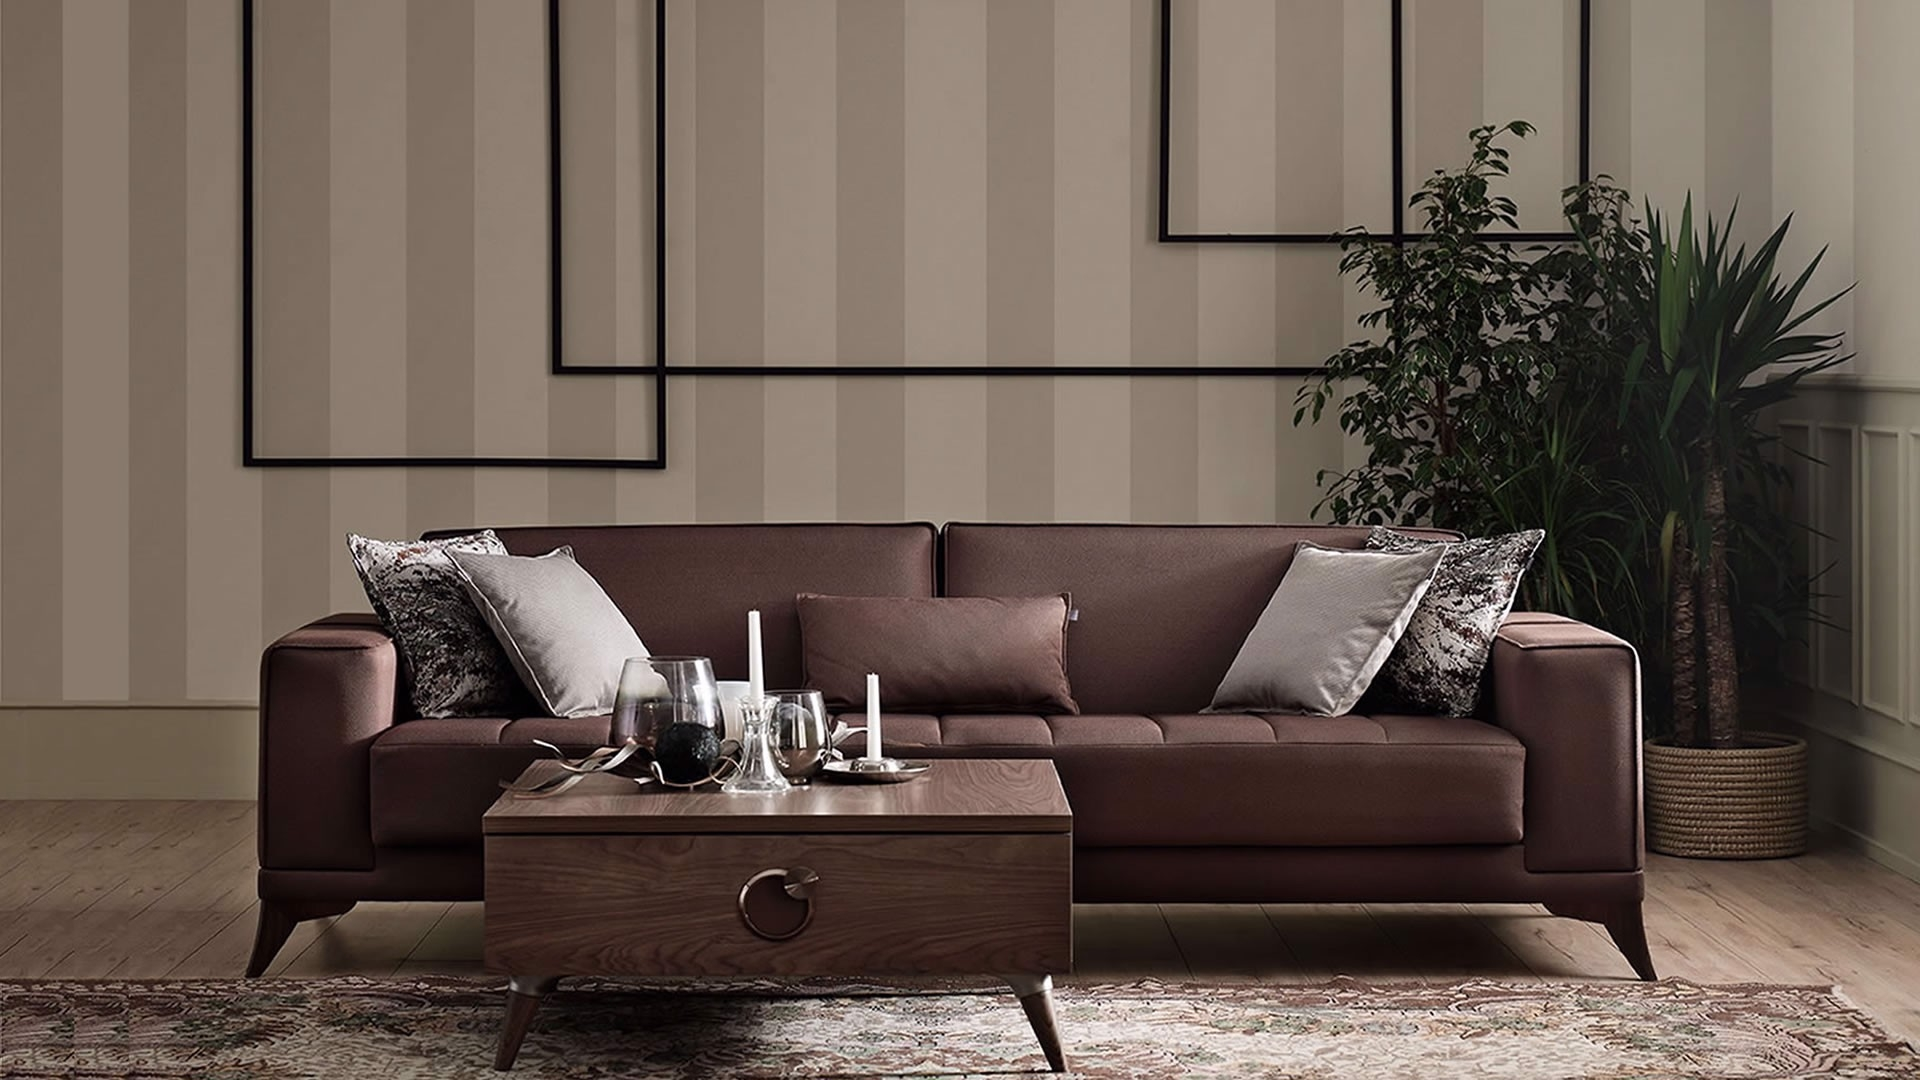 Canapea extensibila tapitata cu stofa, 3 locuri Maison Maro, l234xA85xH80 cm poza